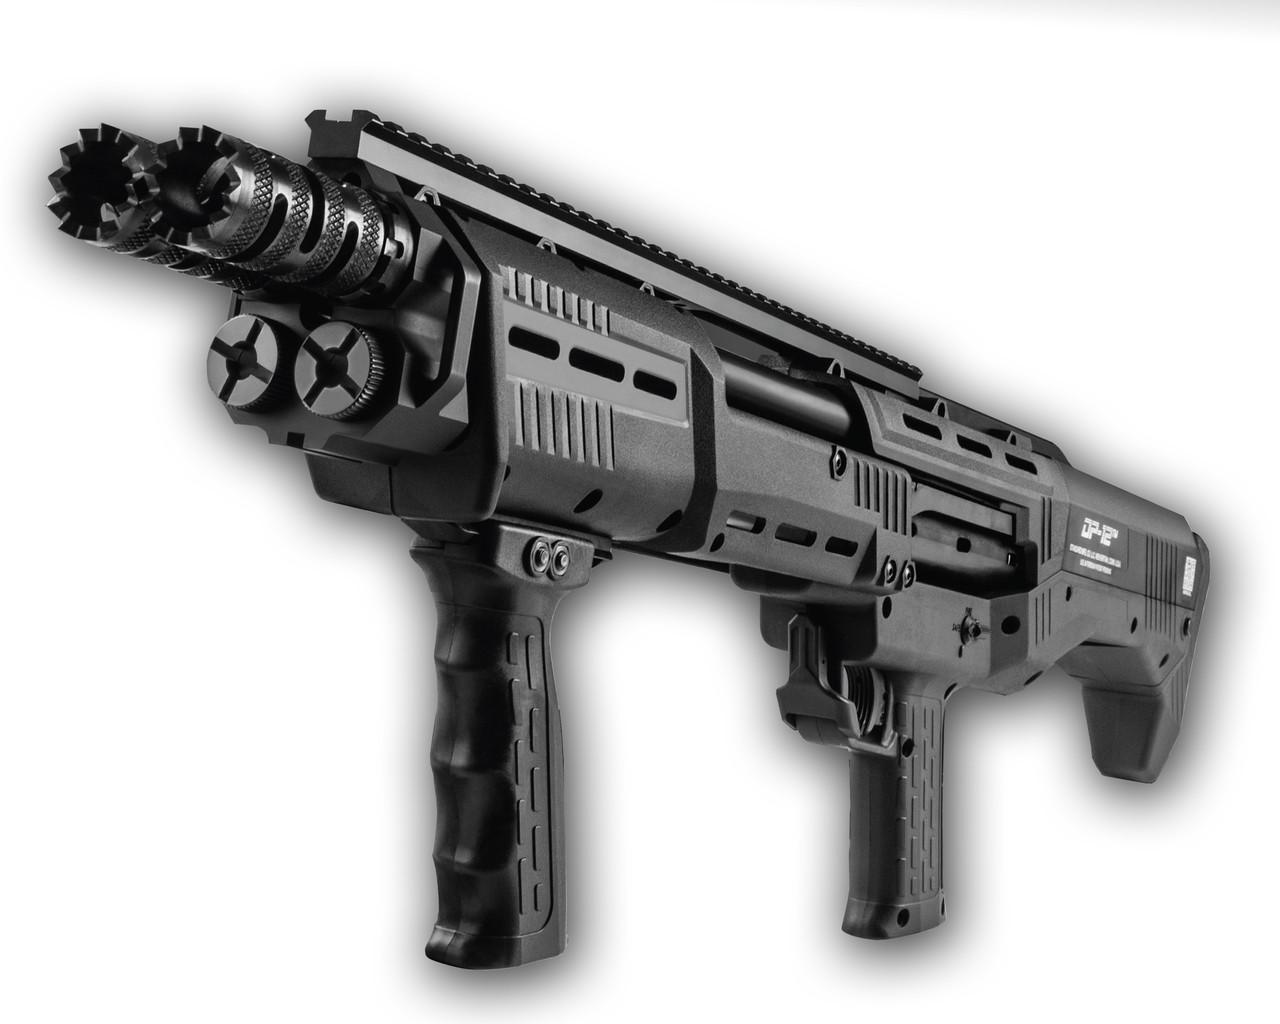 ... Doorbuster Tactical Choke (Sold as a pair)  sc 1 st  Standard Mfg. & Doorbuster Tactical Choke (Sold as a pair) - Standard Mfg. Co. LLC